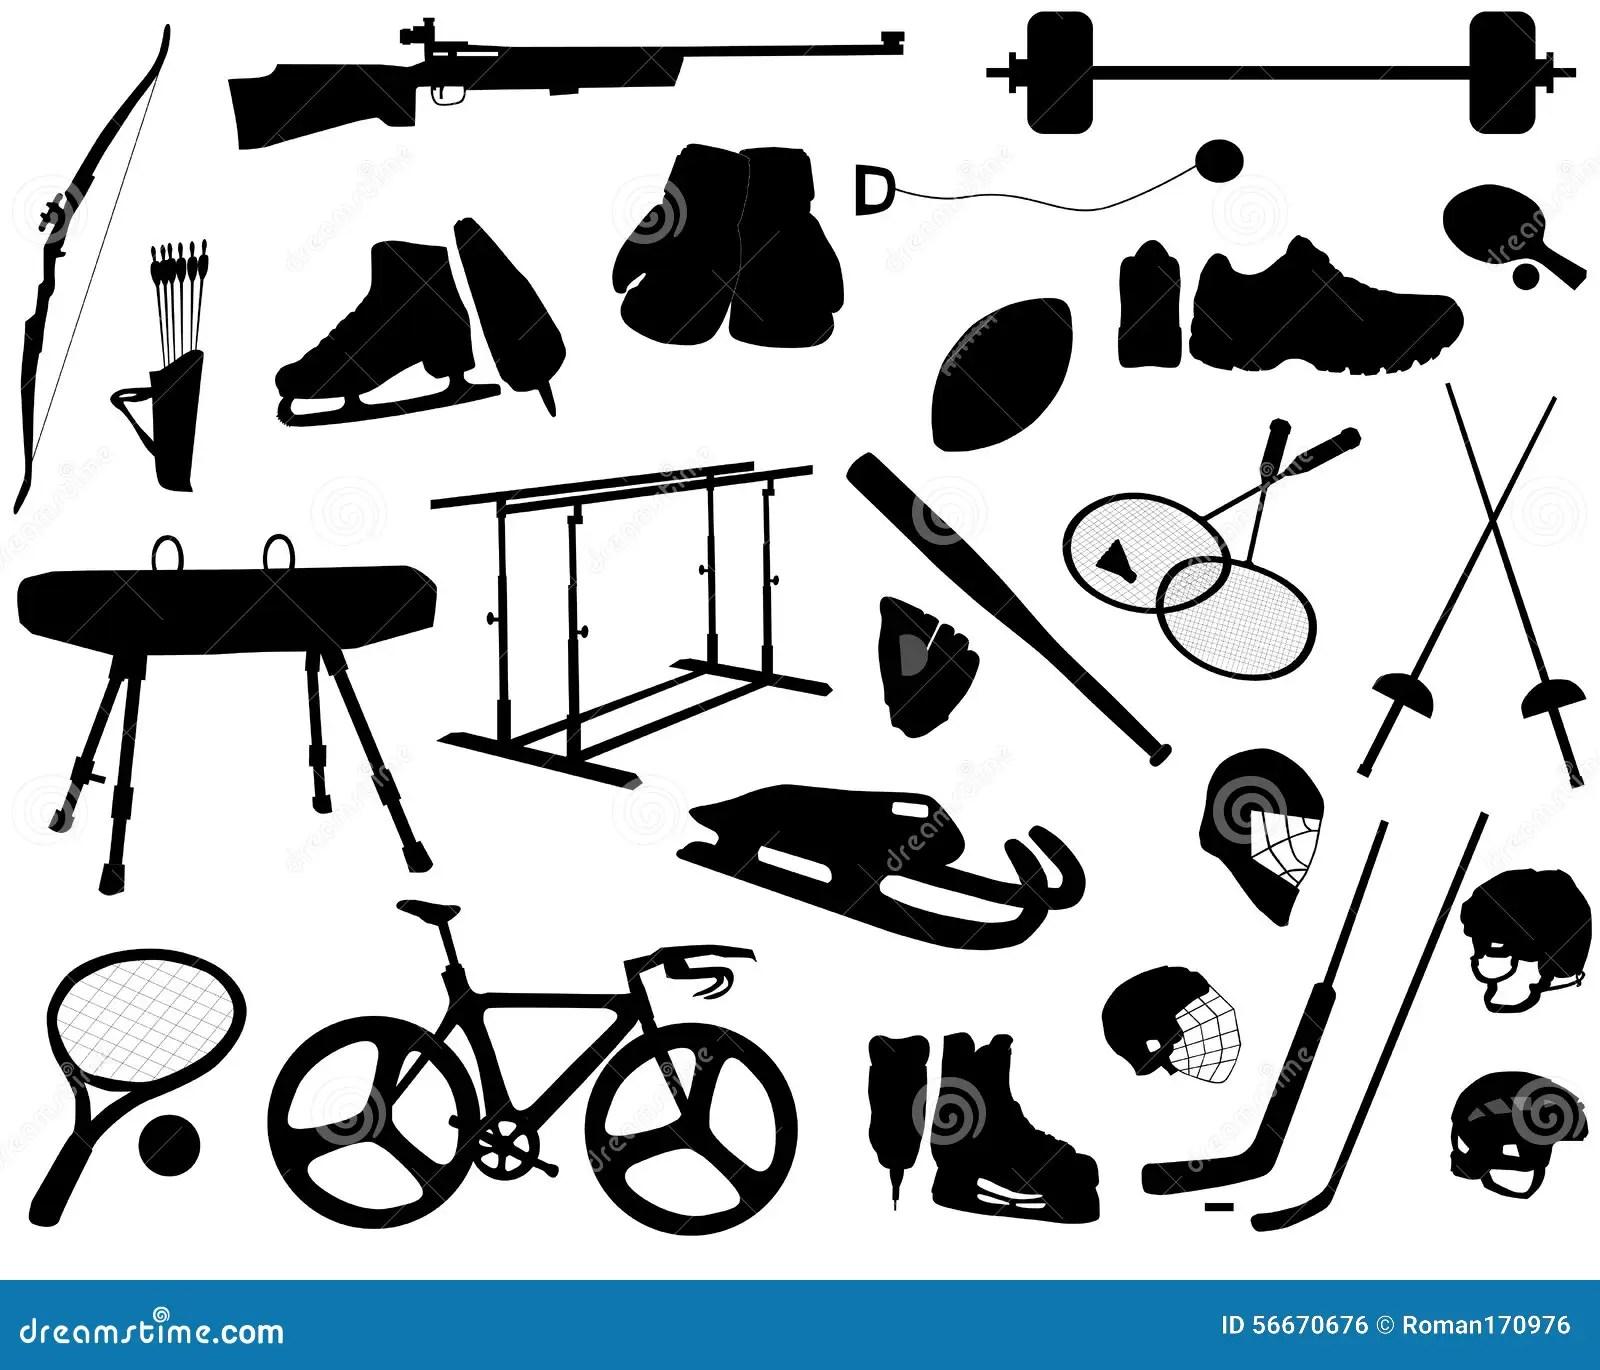 Sports Equipment Stock Vector Illustration Of Racket